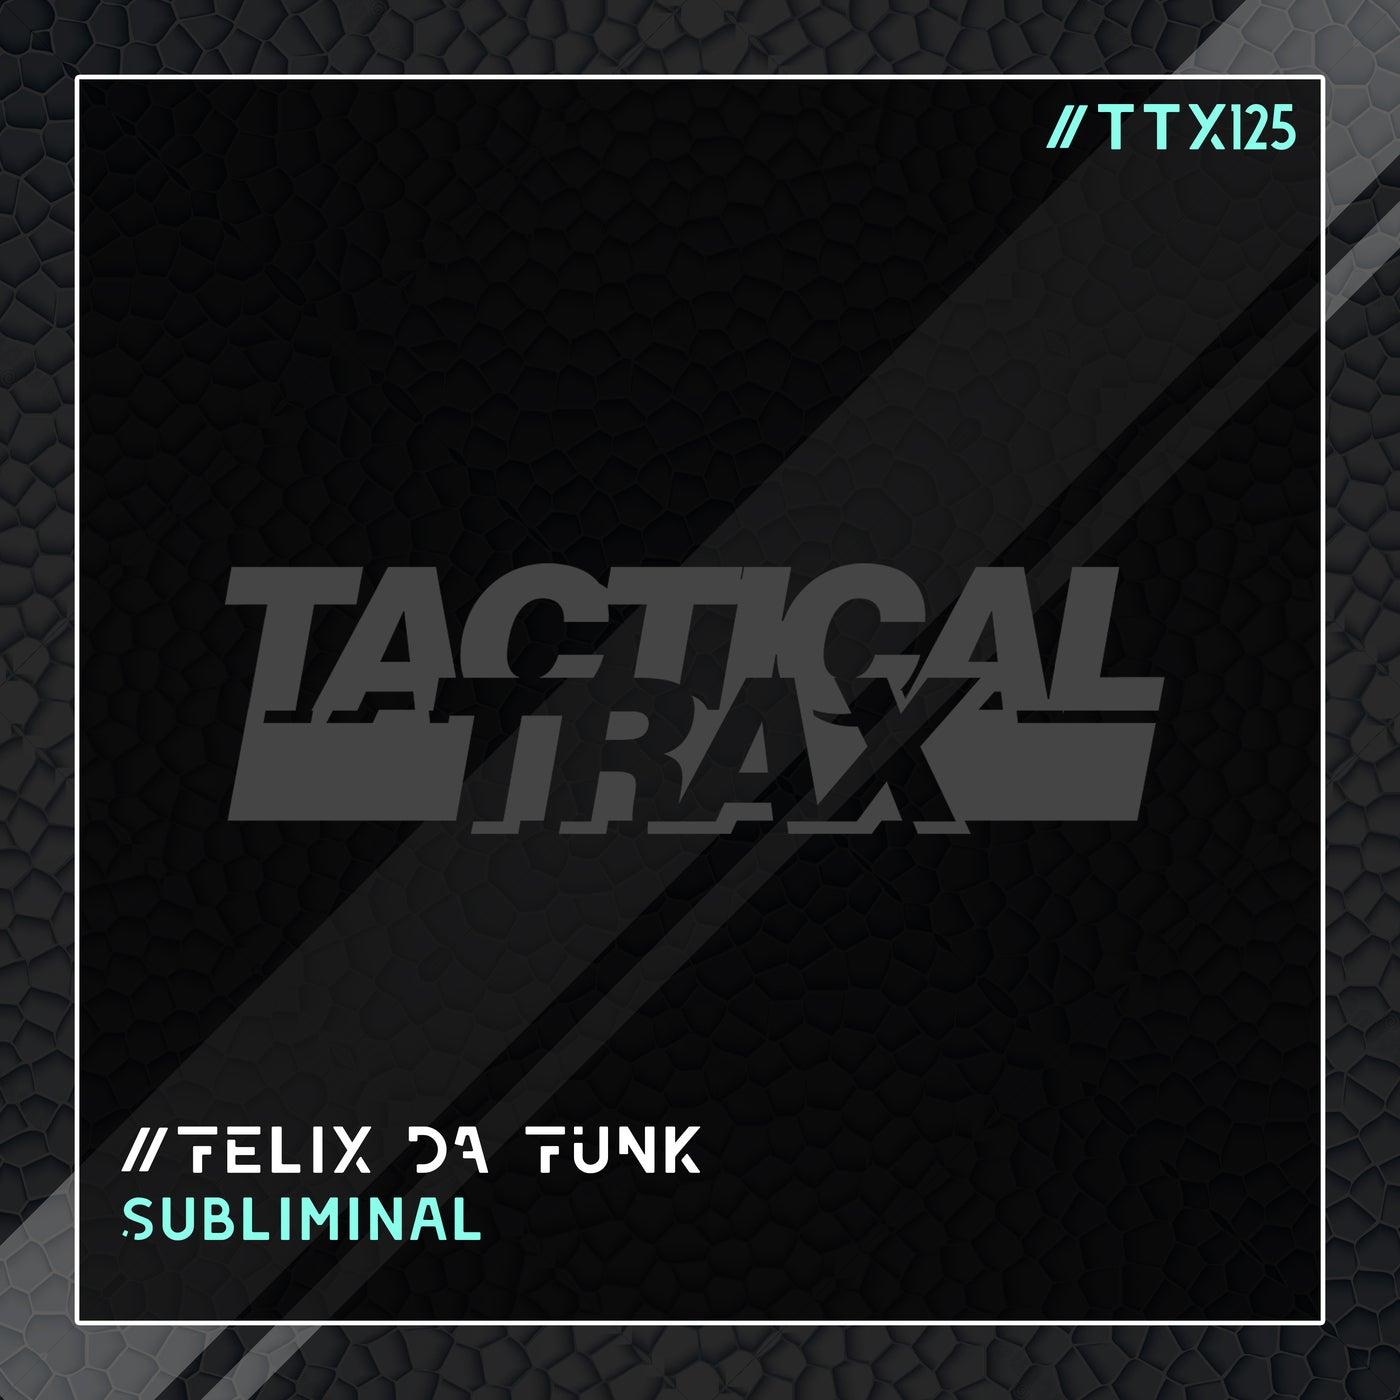 Subliminal (Original Mix)